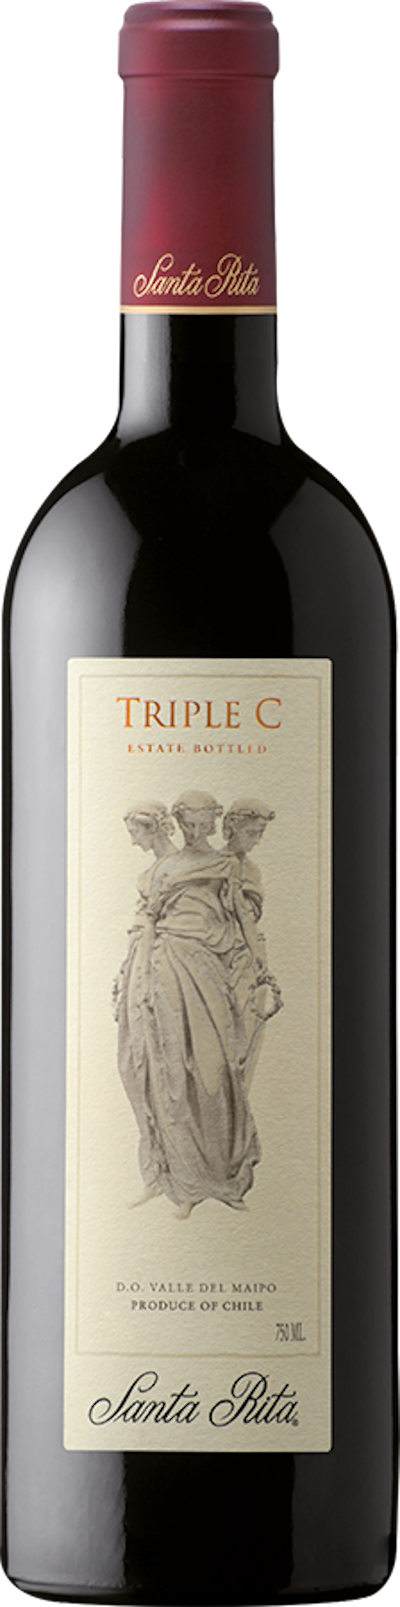 Santa Rita - Triple C